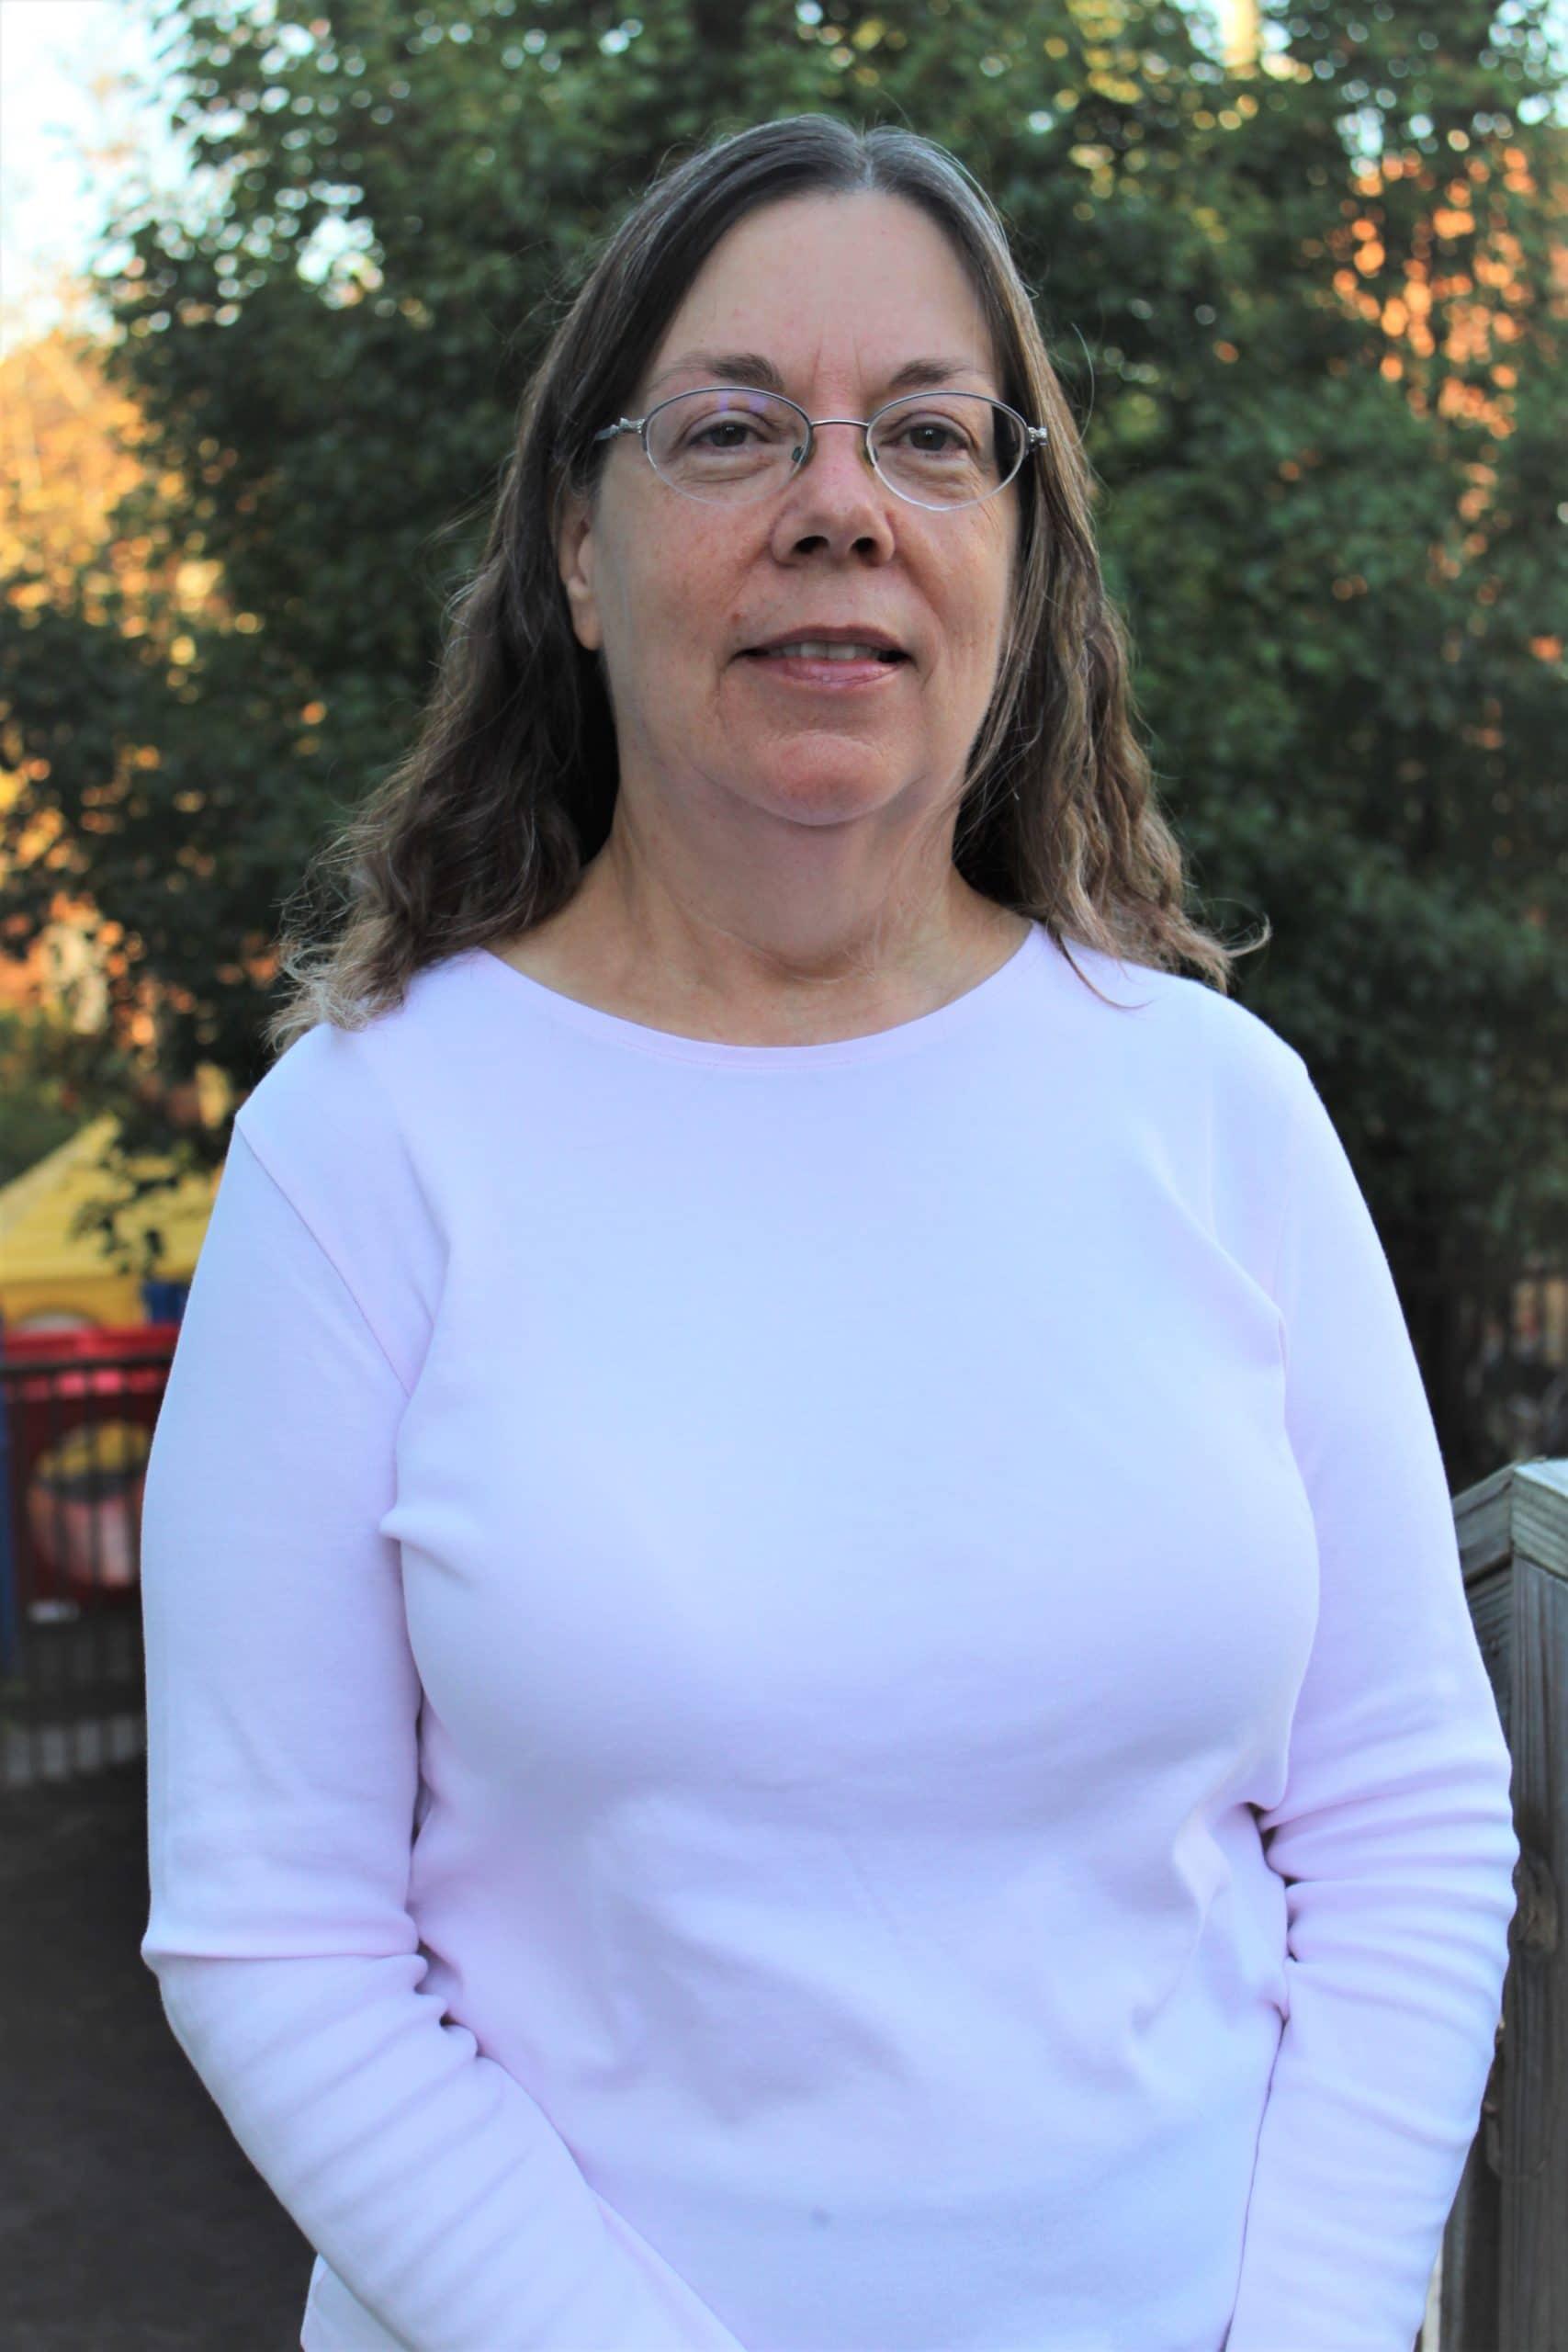 Judi, white shirt, tree background, female, teacher